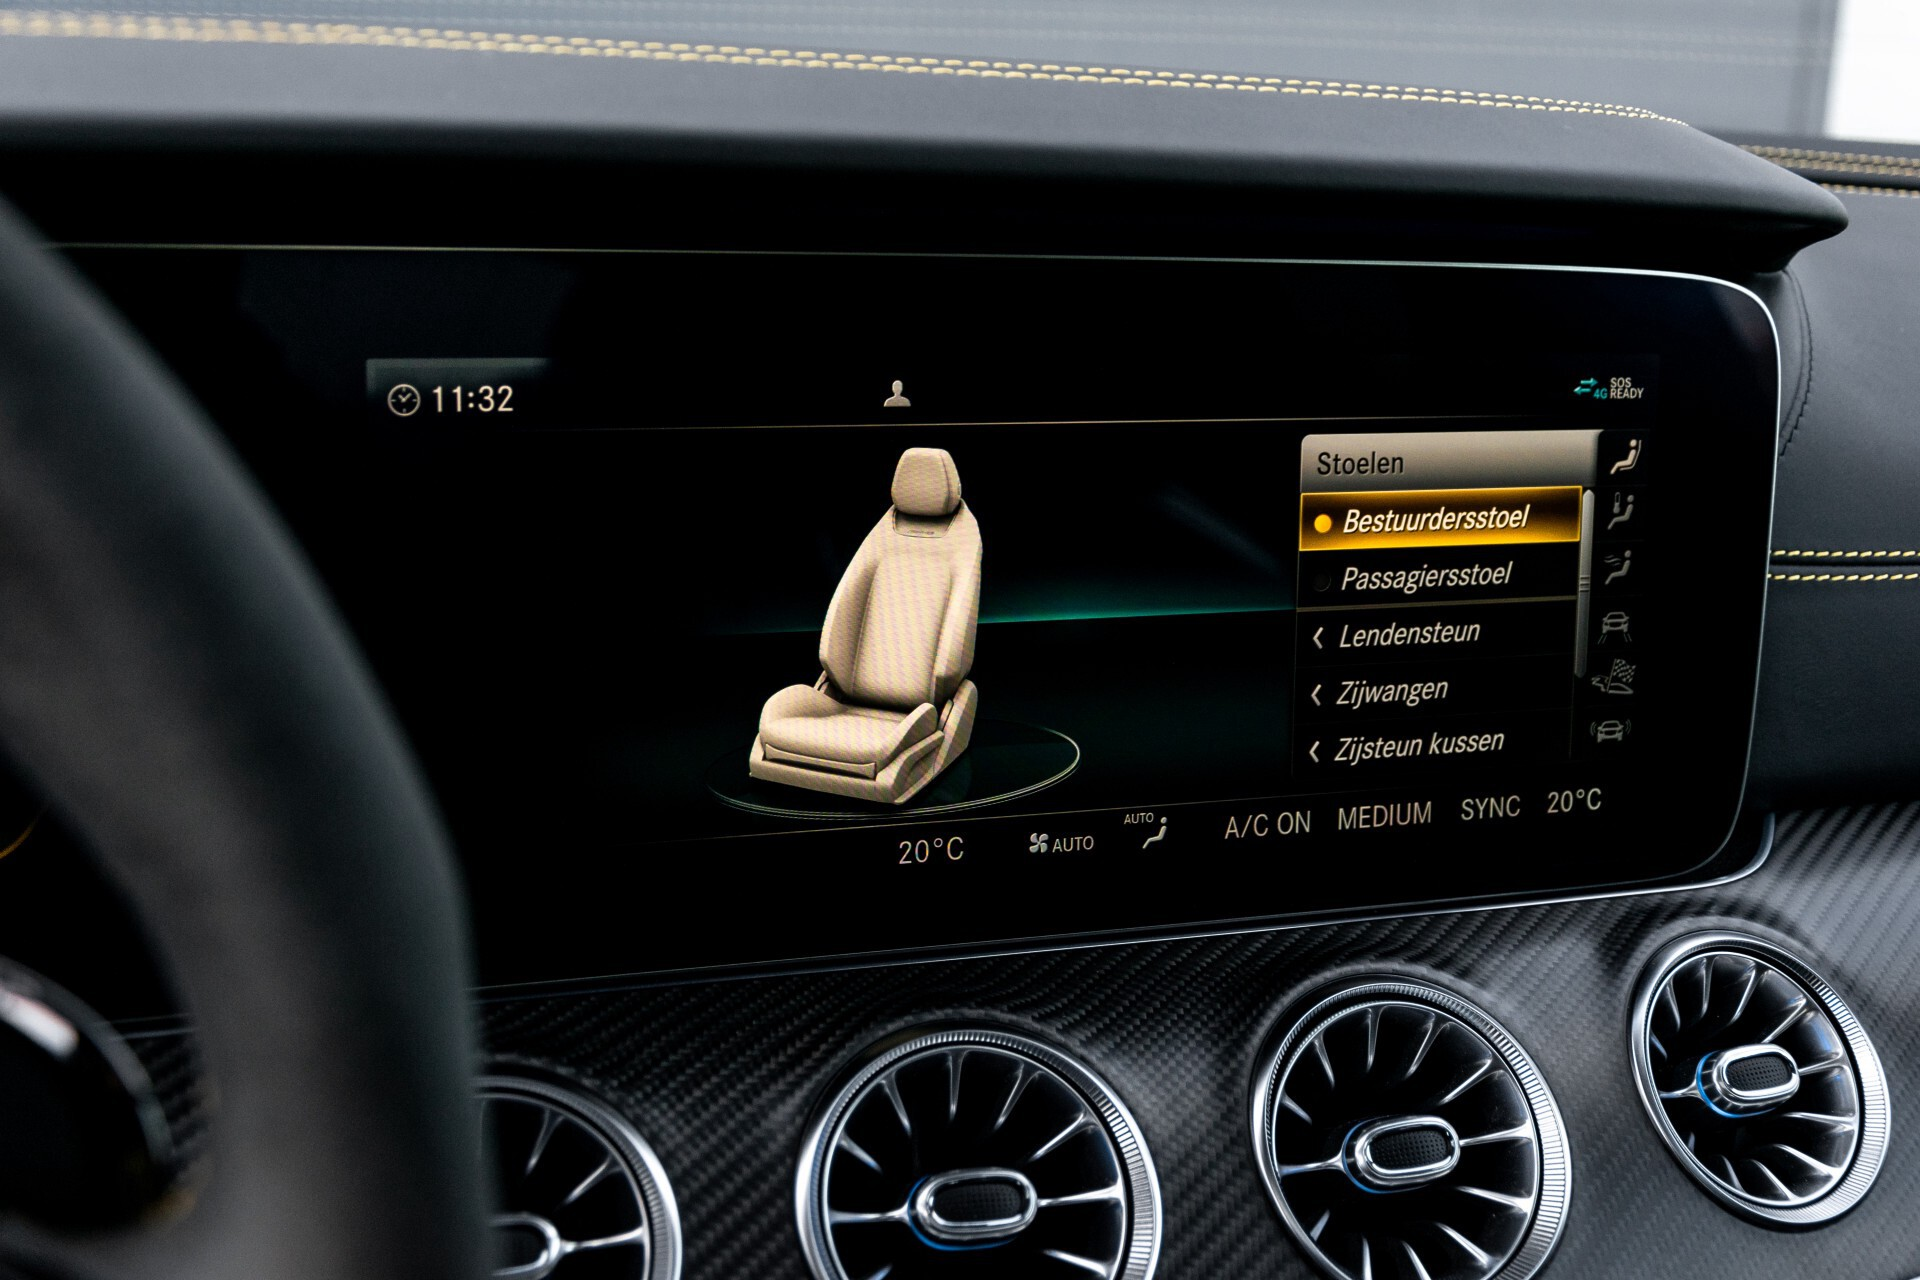 Mercedes-Benz AMG GT 4-Door Coupe 63 S 4MATIC+ Edition 1 Keramisch/Carbon/First Class/Dynamic Plus/Burmester High End 3D Aut9 Foto 29